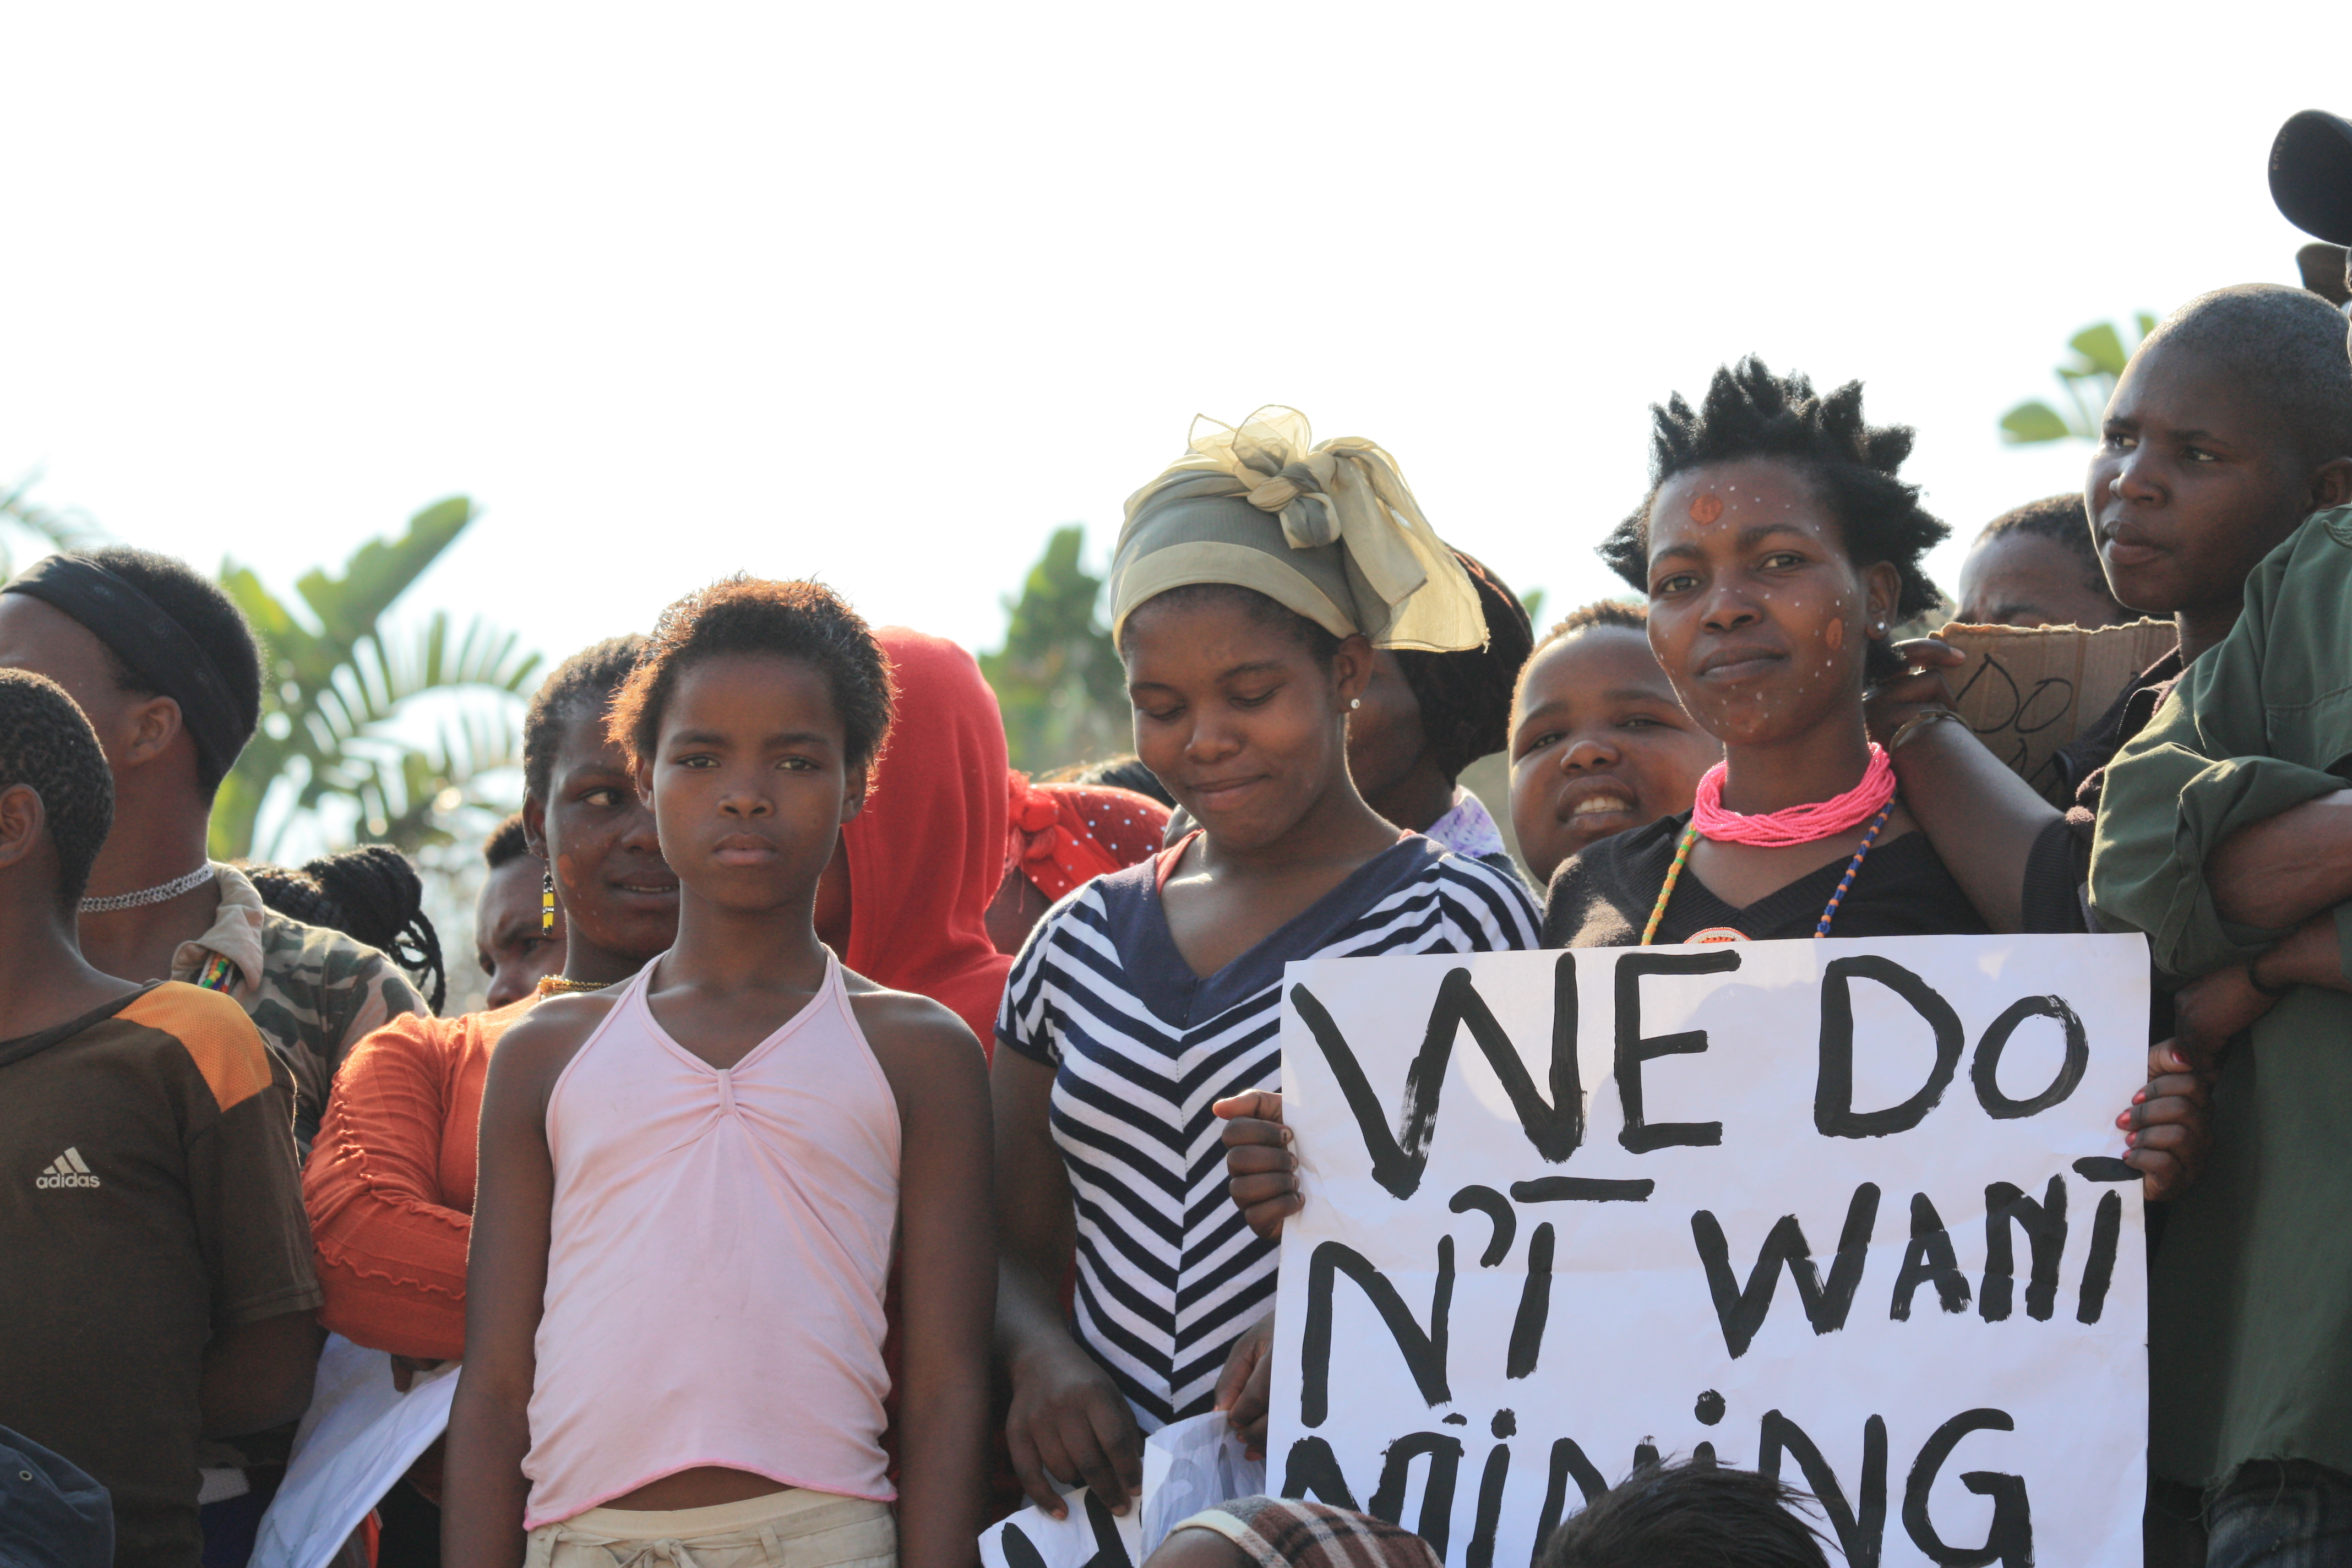 community amadiba protest against mining